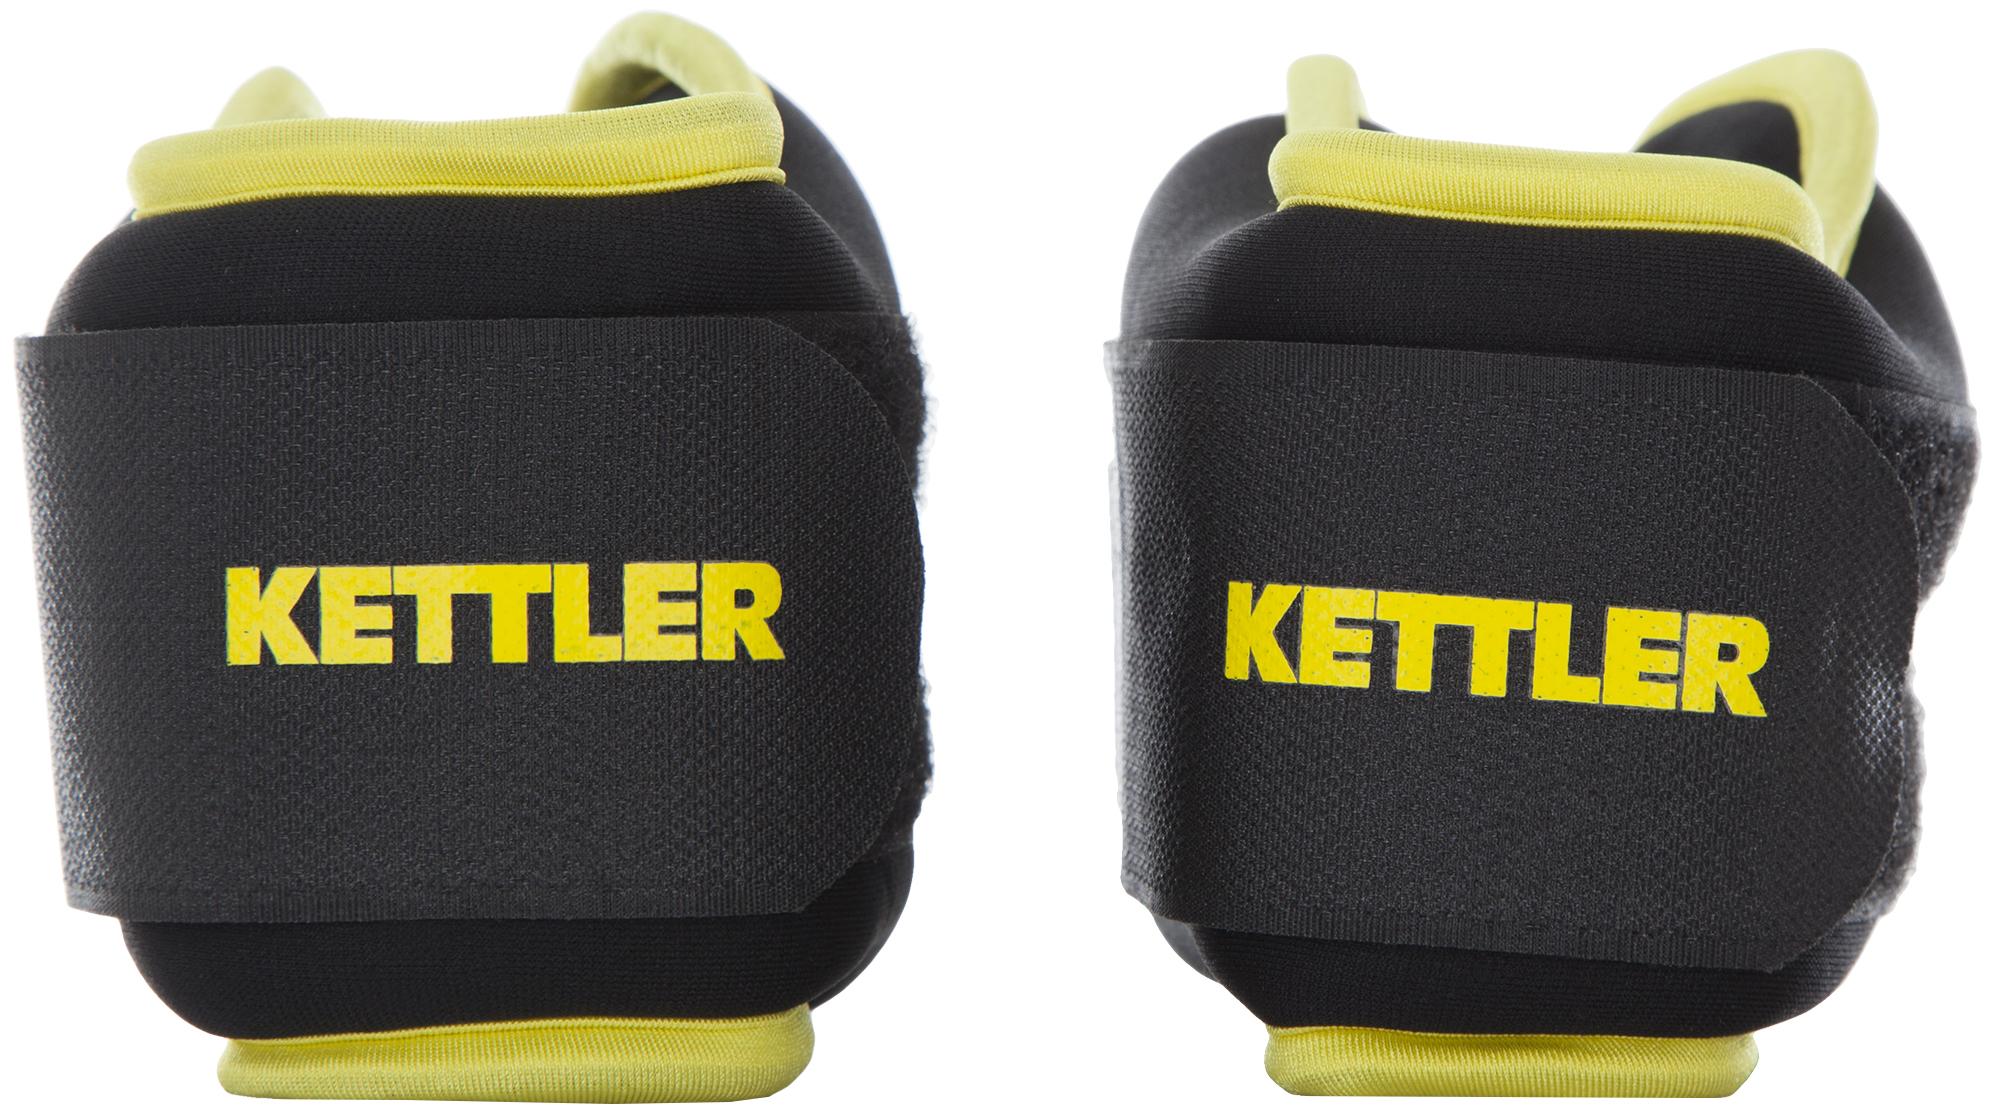 Kettler Утяжелители для рук Kettler, 2 х 1,5 кг утяжелители atemi цвет черный 2 х 2 кг